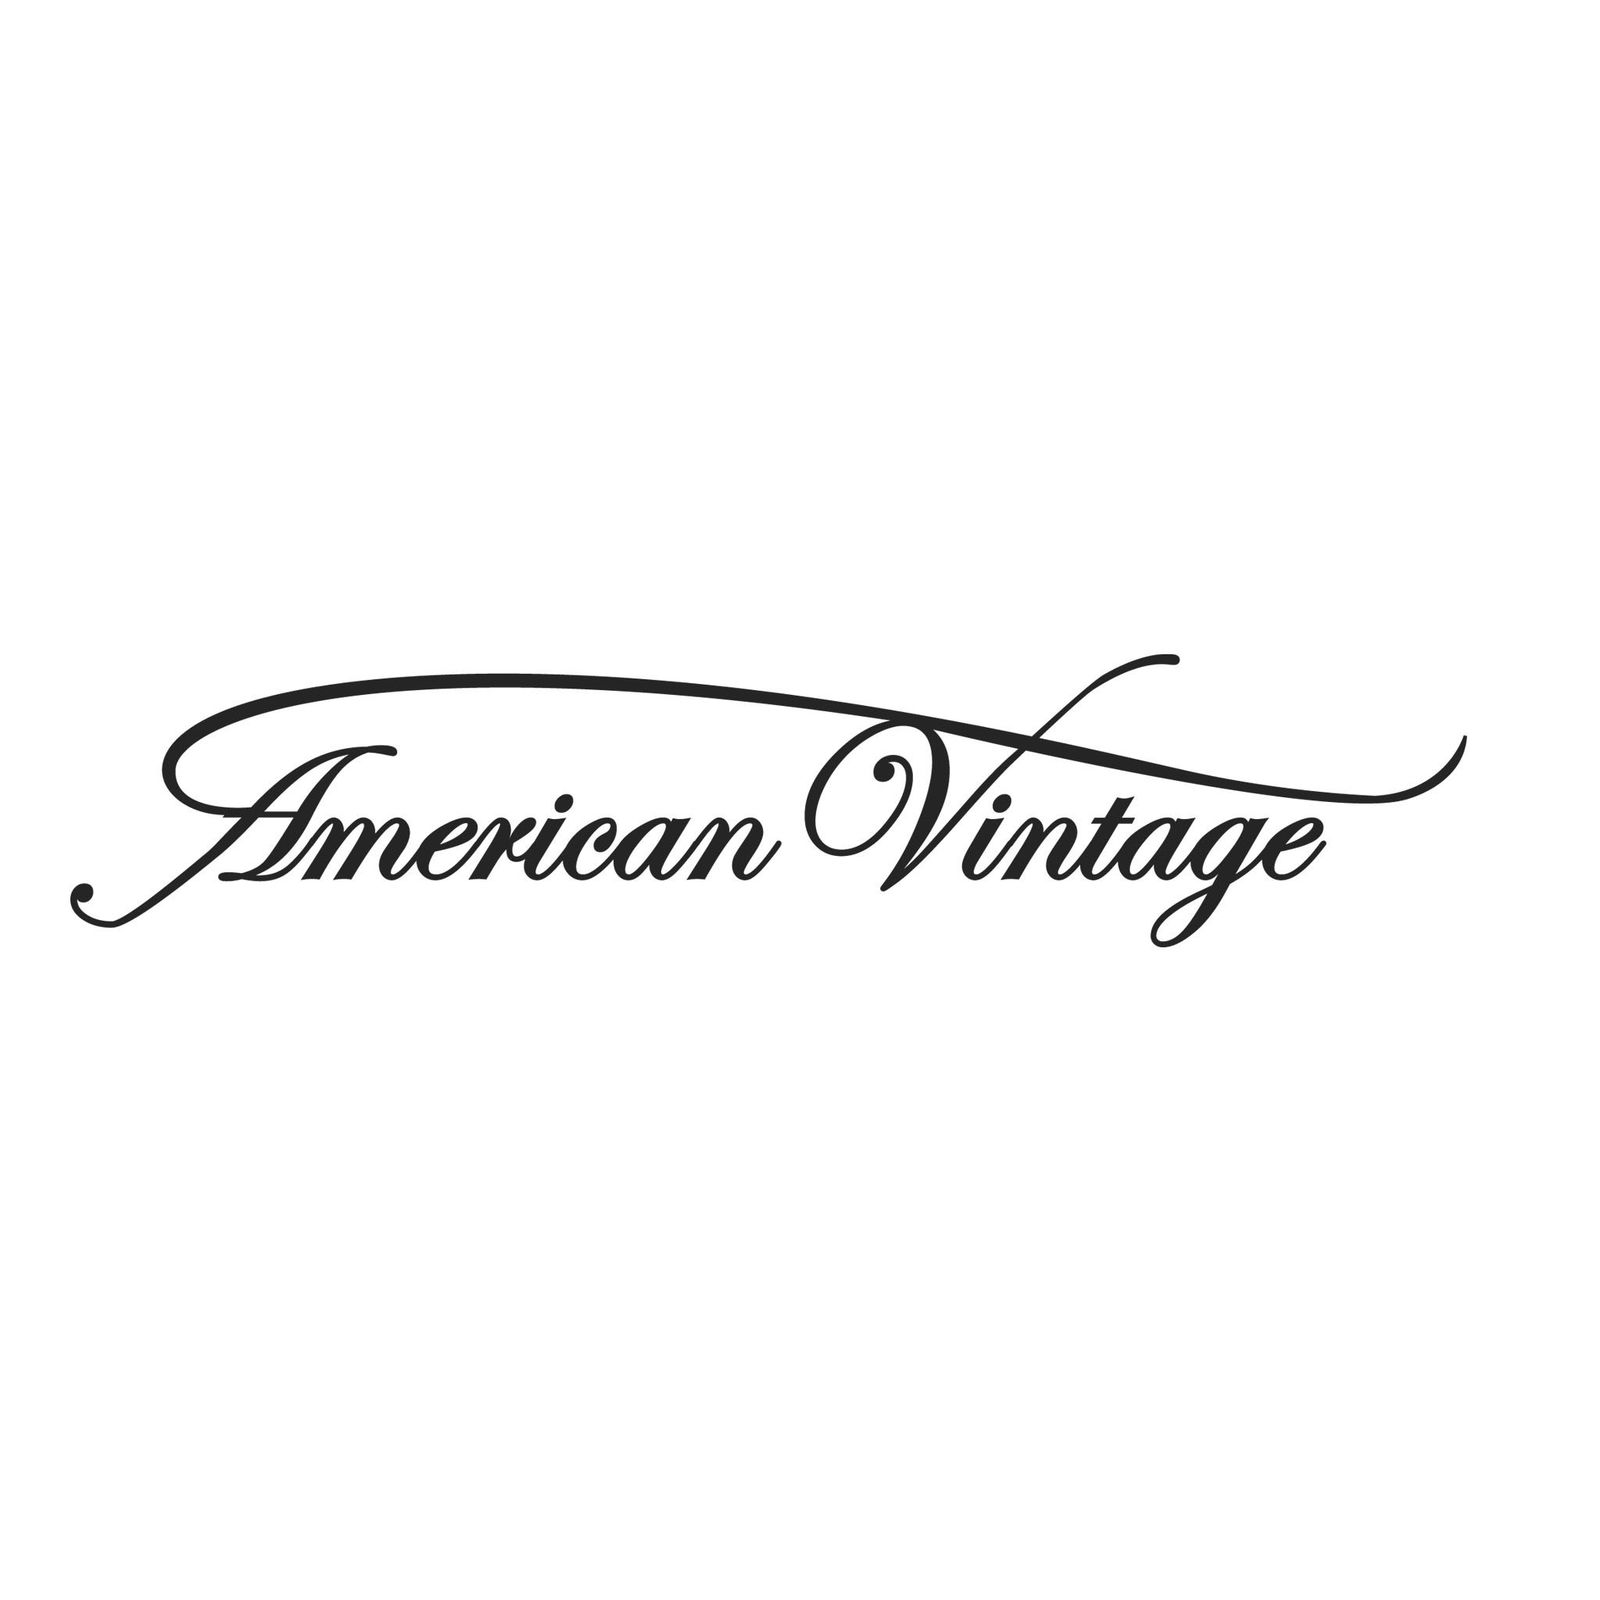 American Vintage (Bild 1)